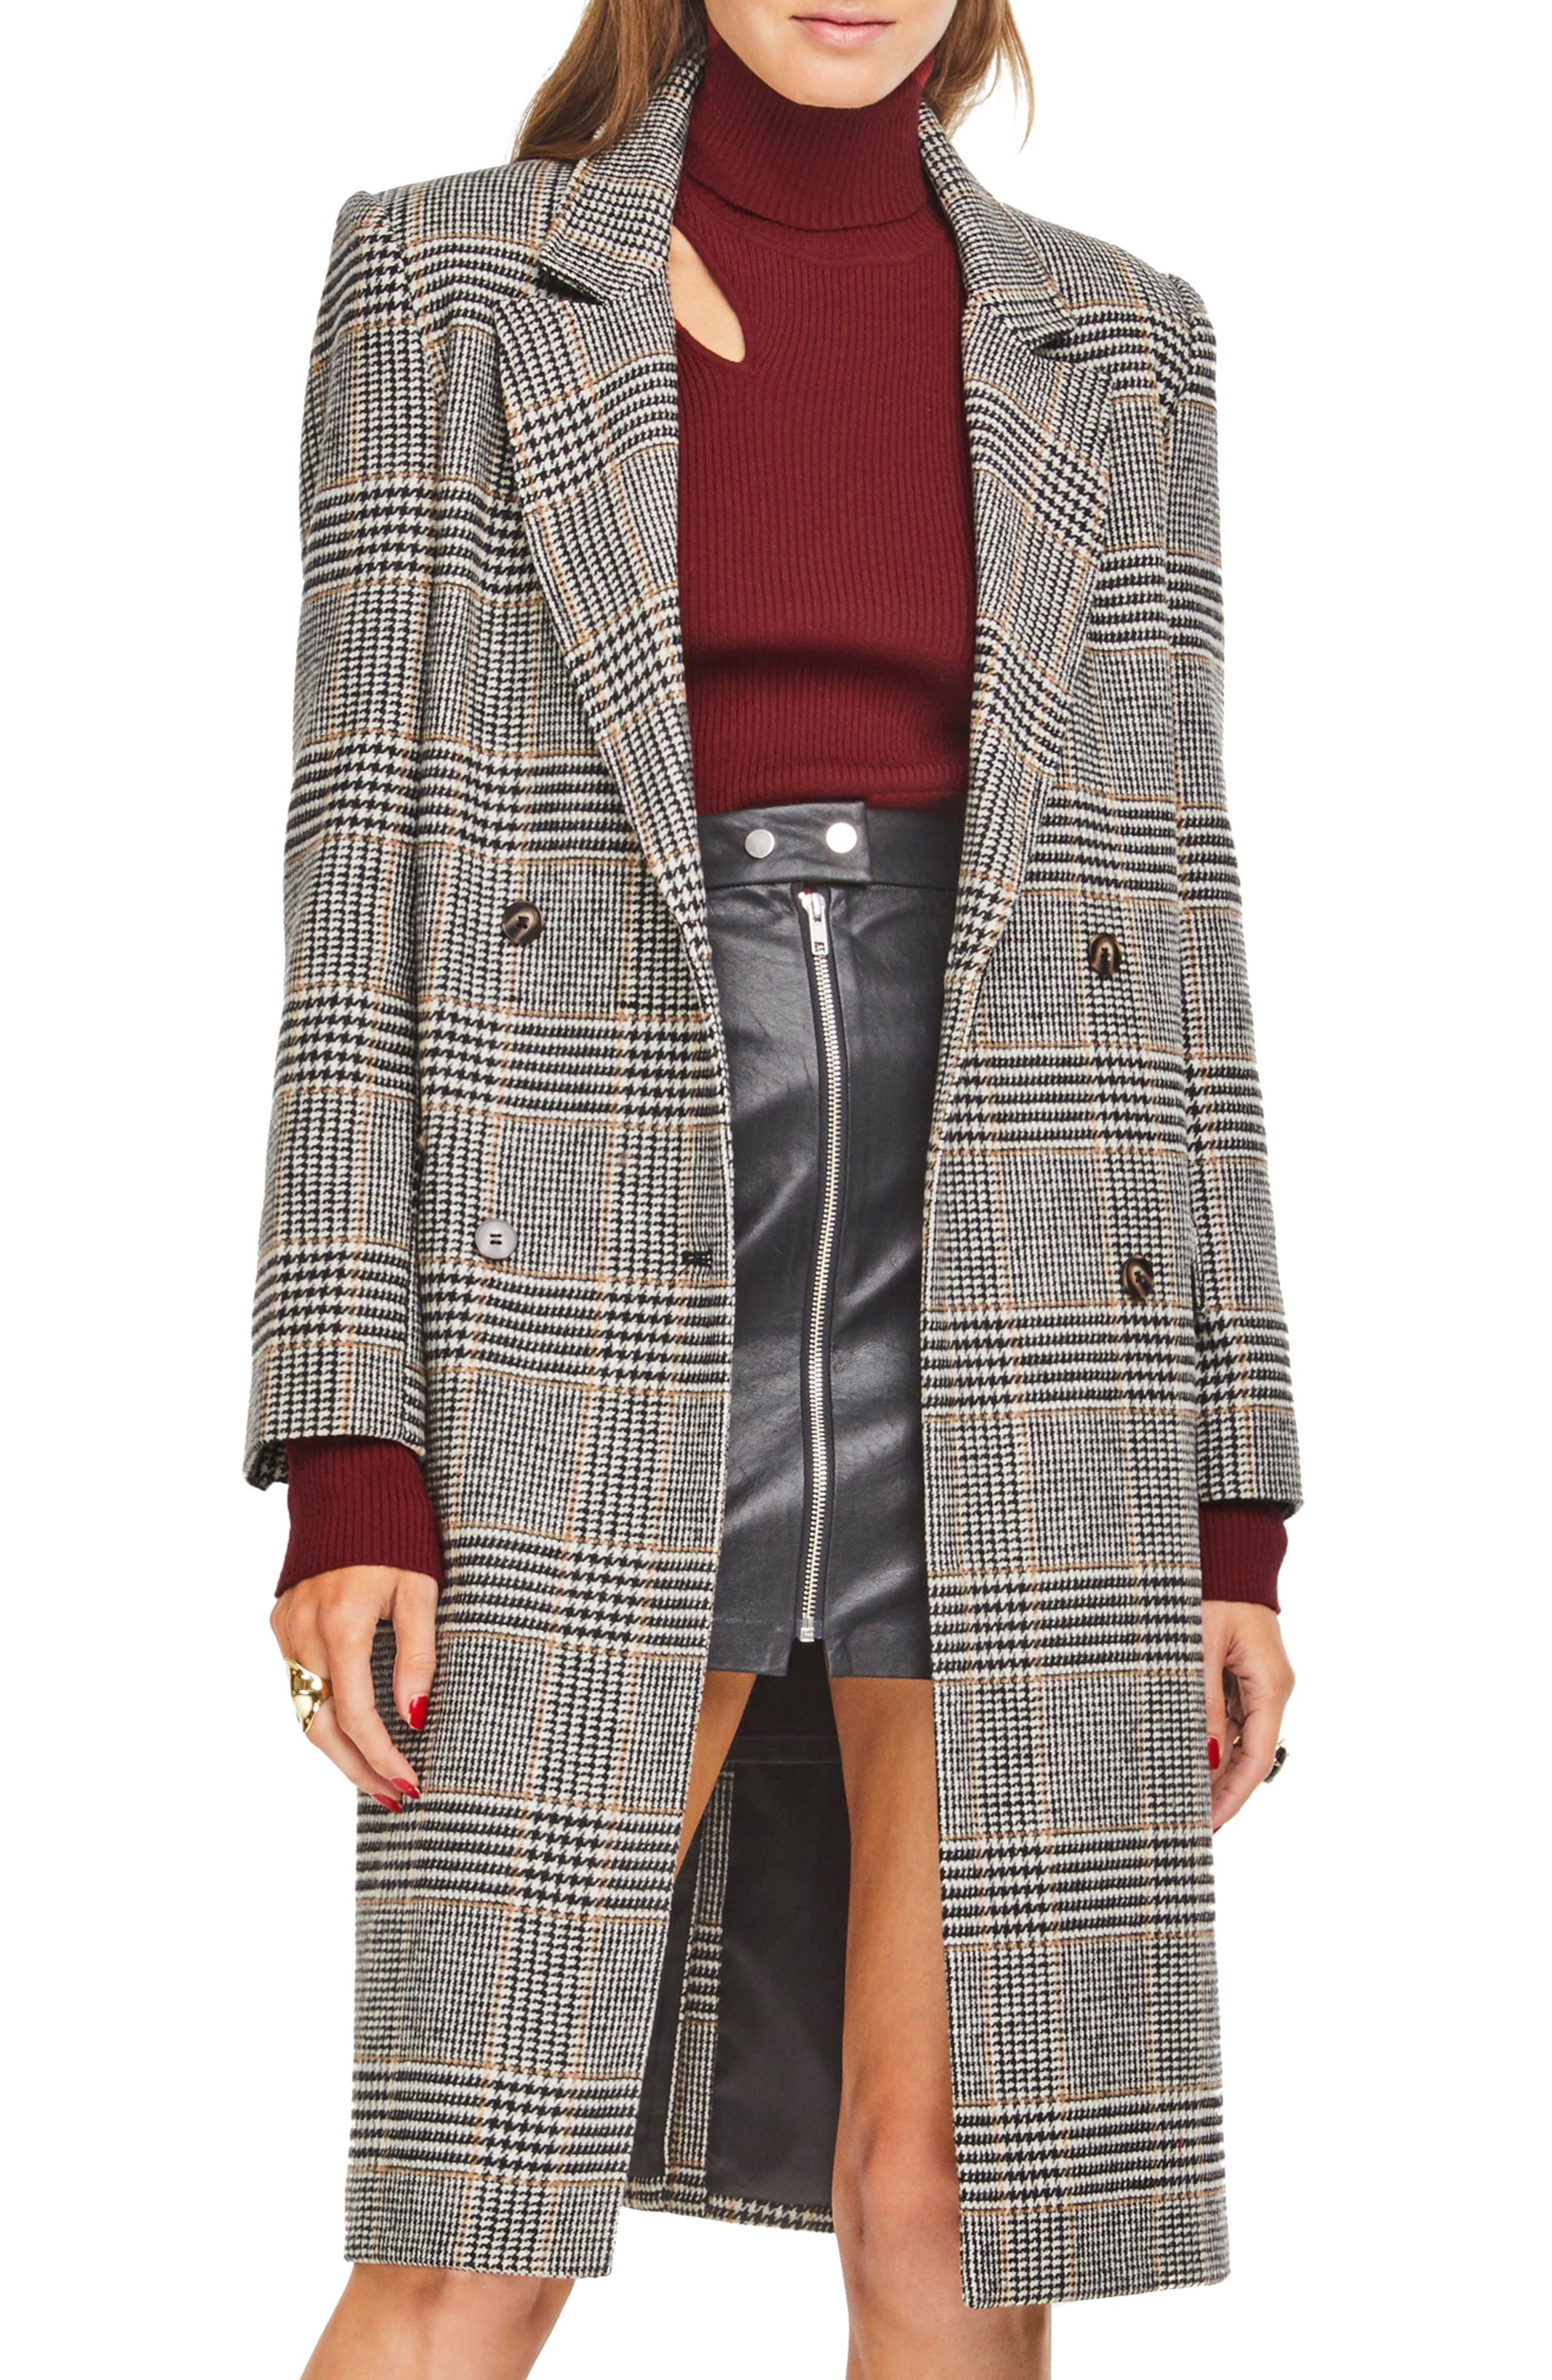 Kensington Plaid Long Coat,                             Main thumbnail 1, color,                             BLACK/ MUSTARD PLAID